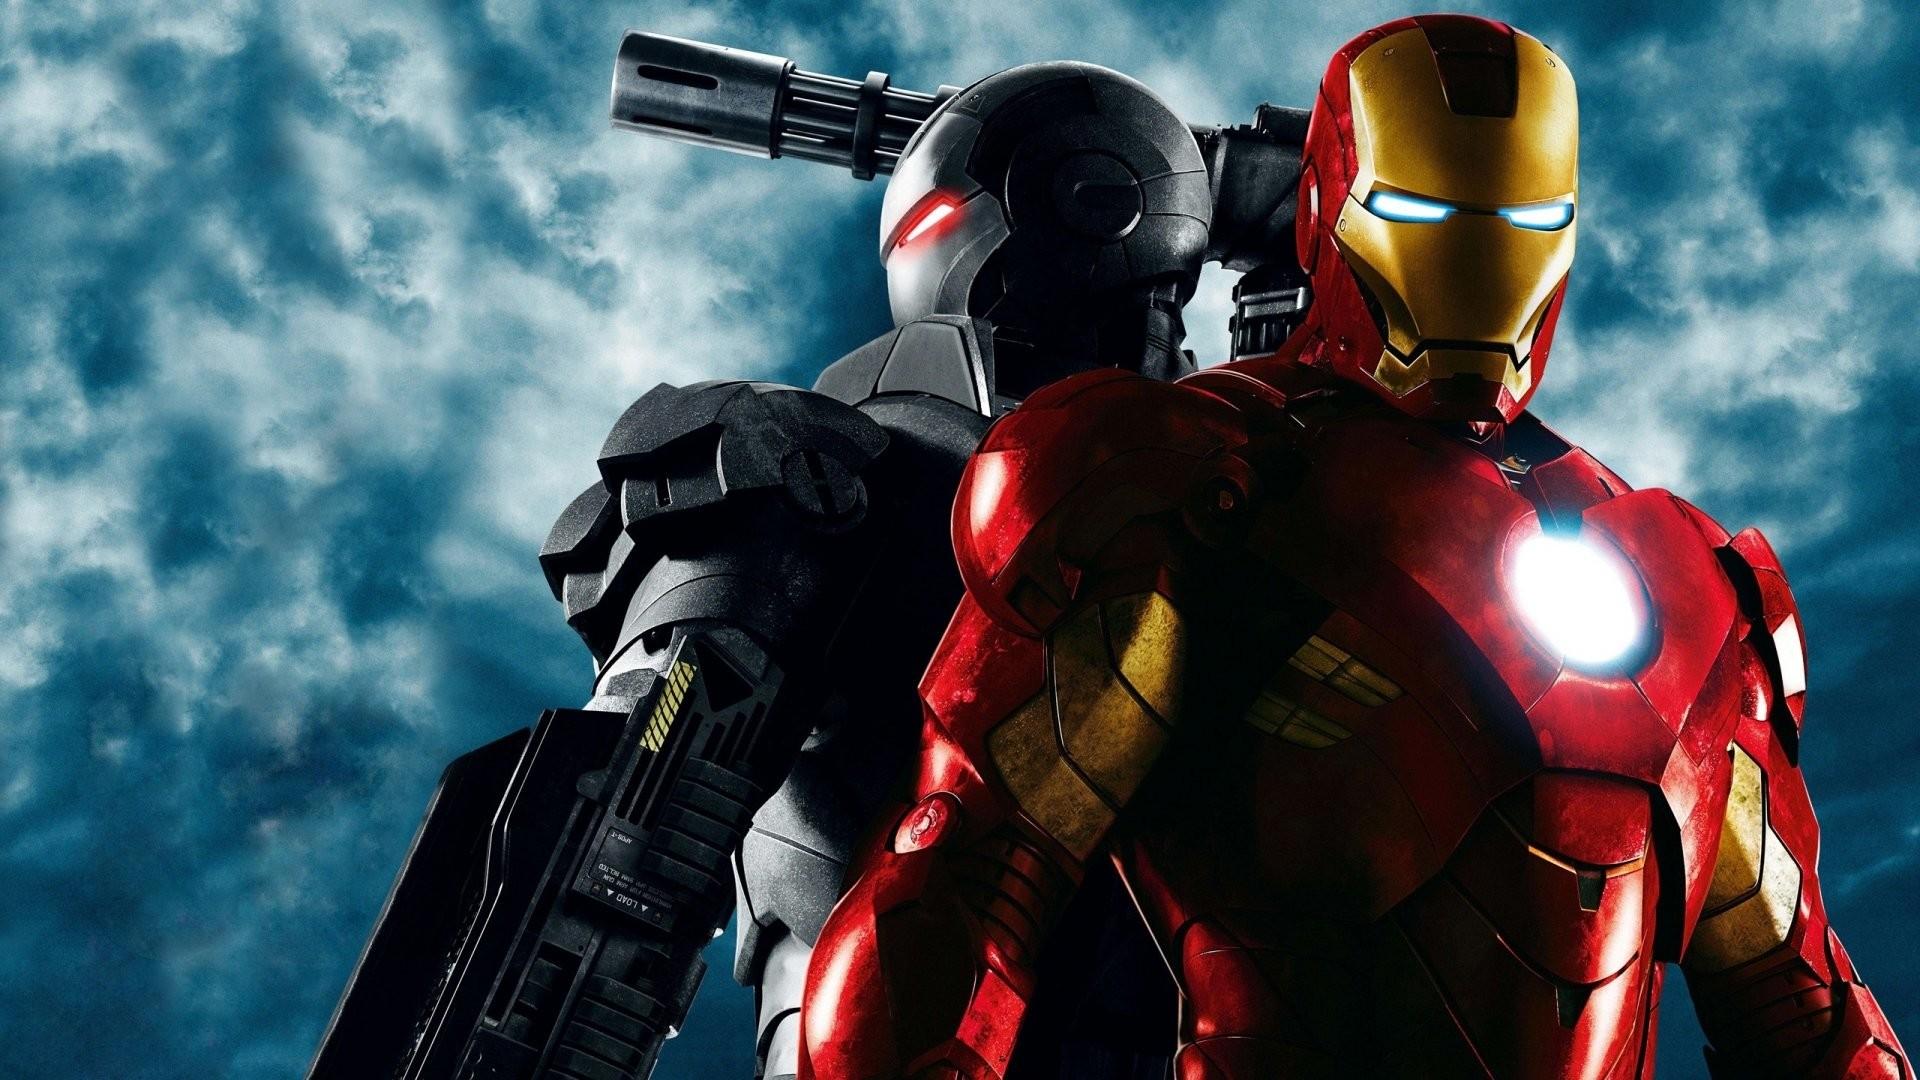 Iron man 2 game free download for pc full version free download.